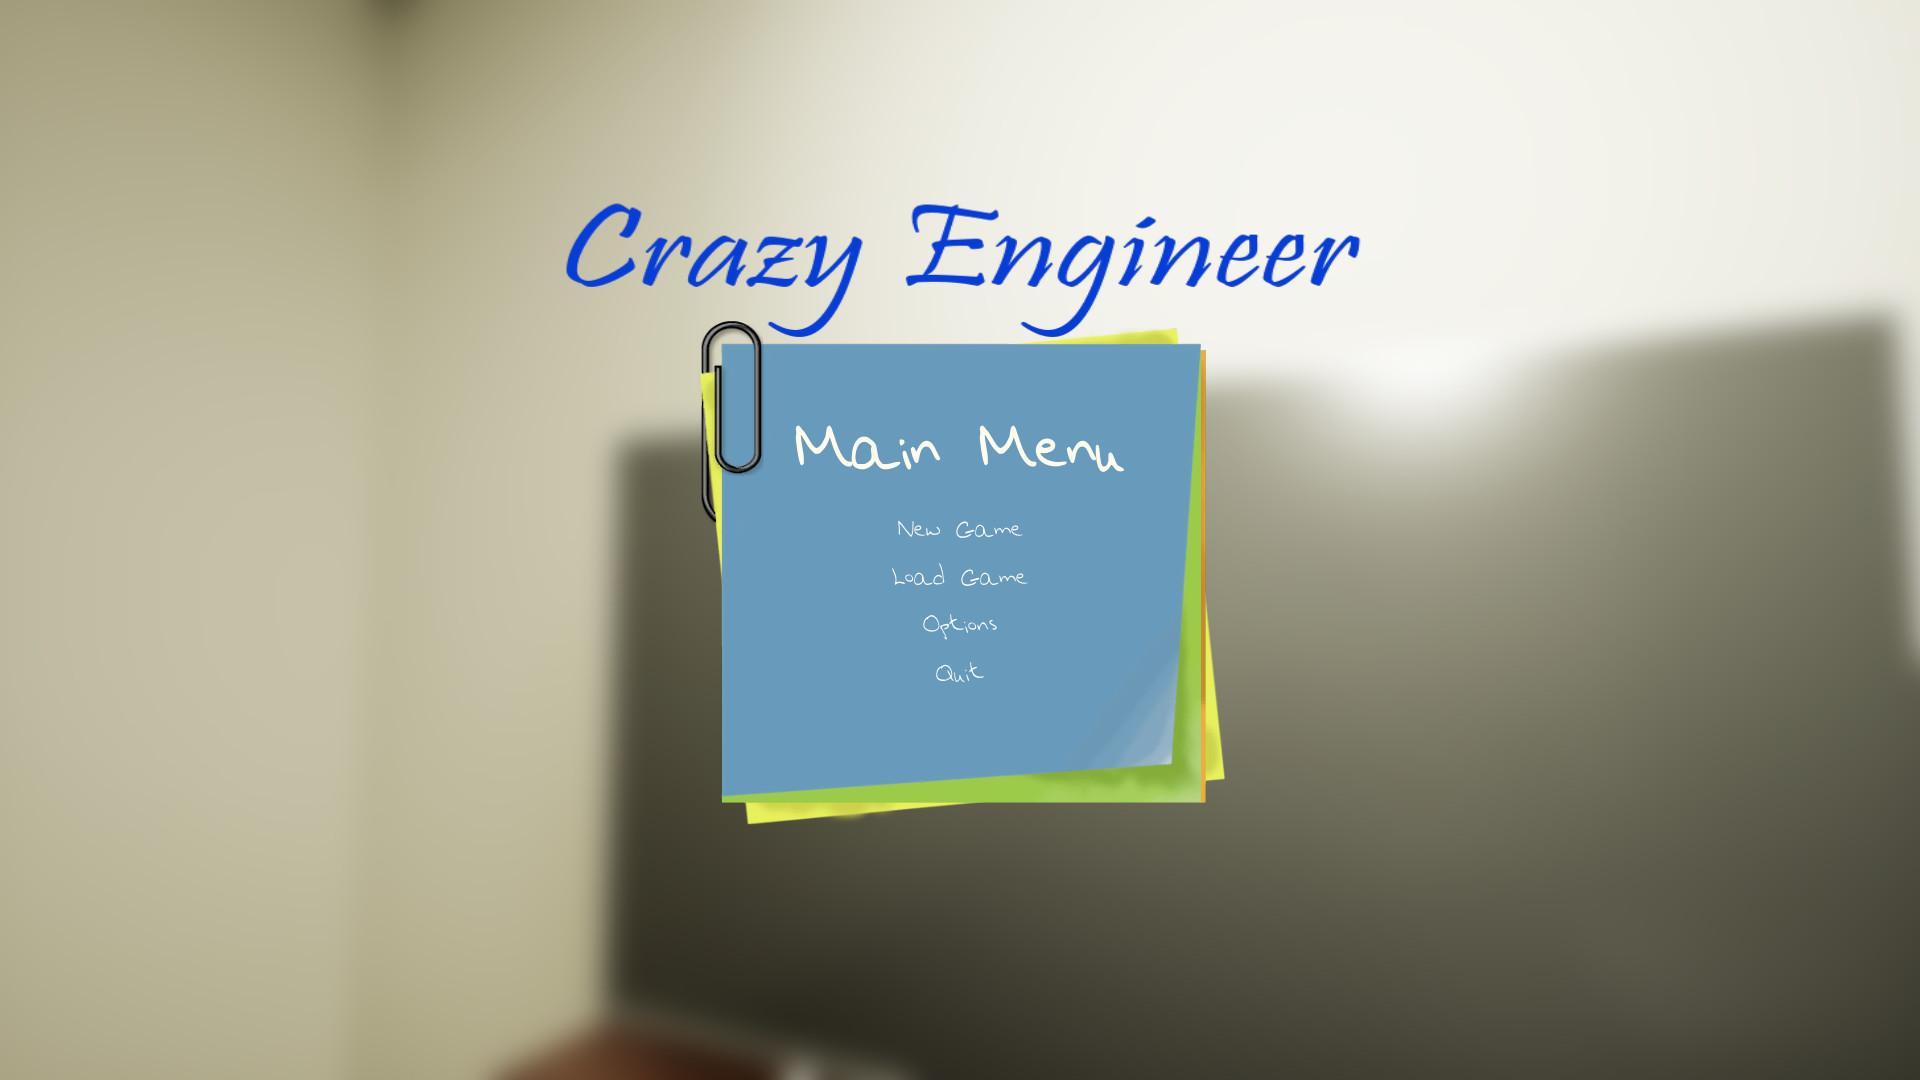 Crazy Engineer Free Download